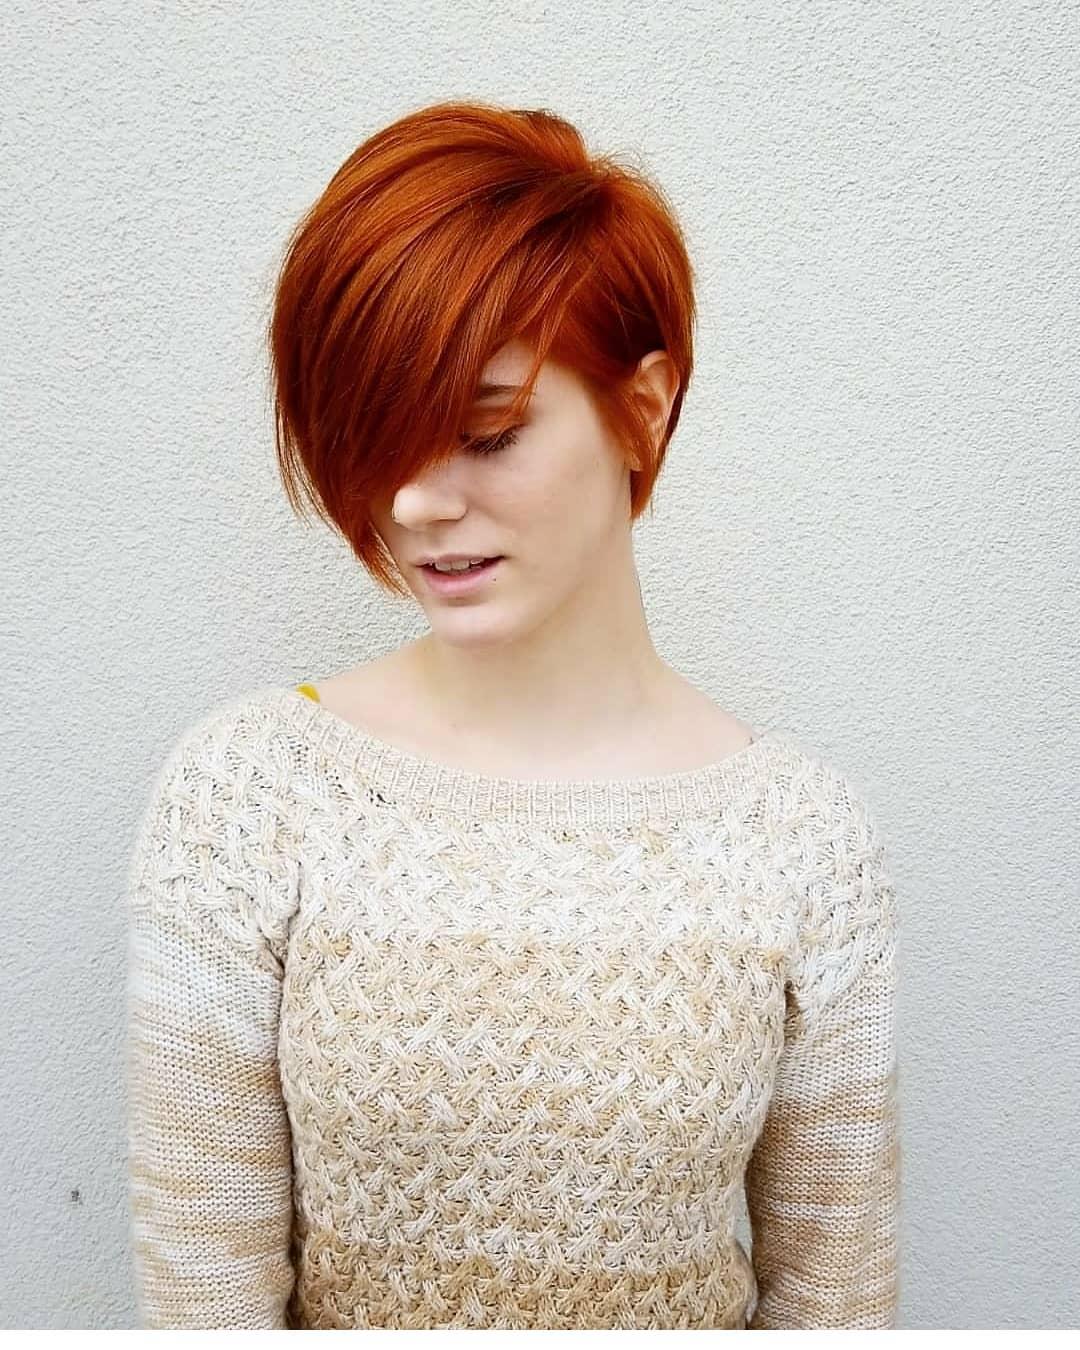 Stylish Asymmetrical Short Pixie Haircuts and Hairstyles, Women Short Hair Style Ideas